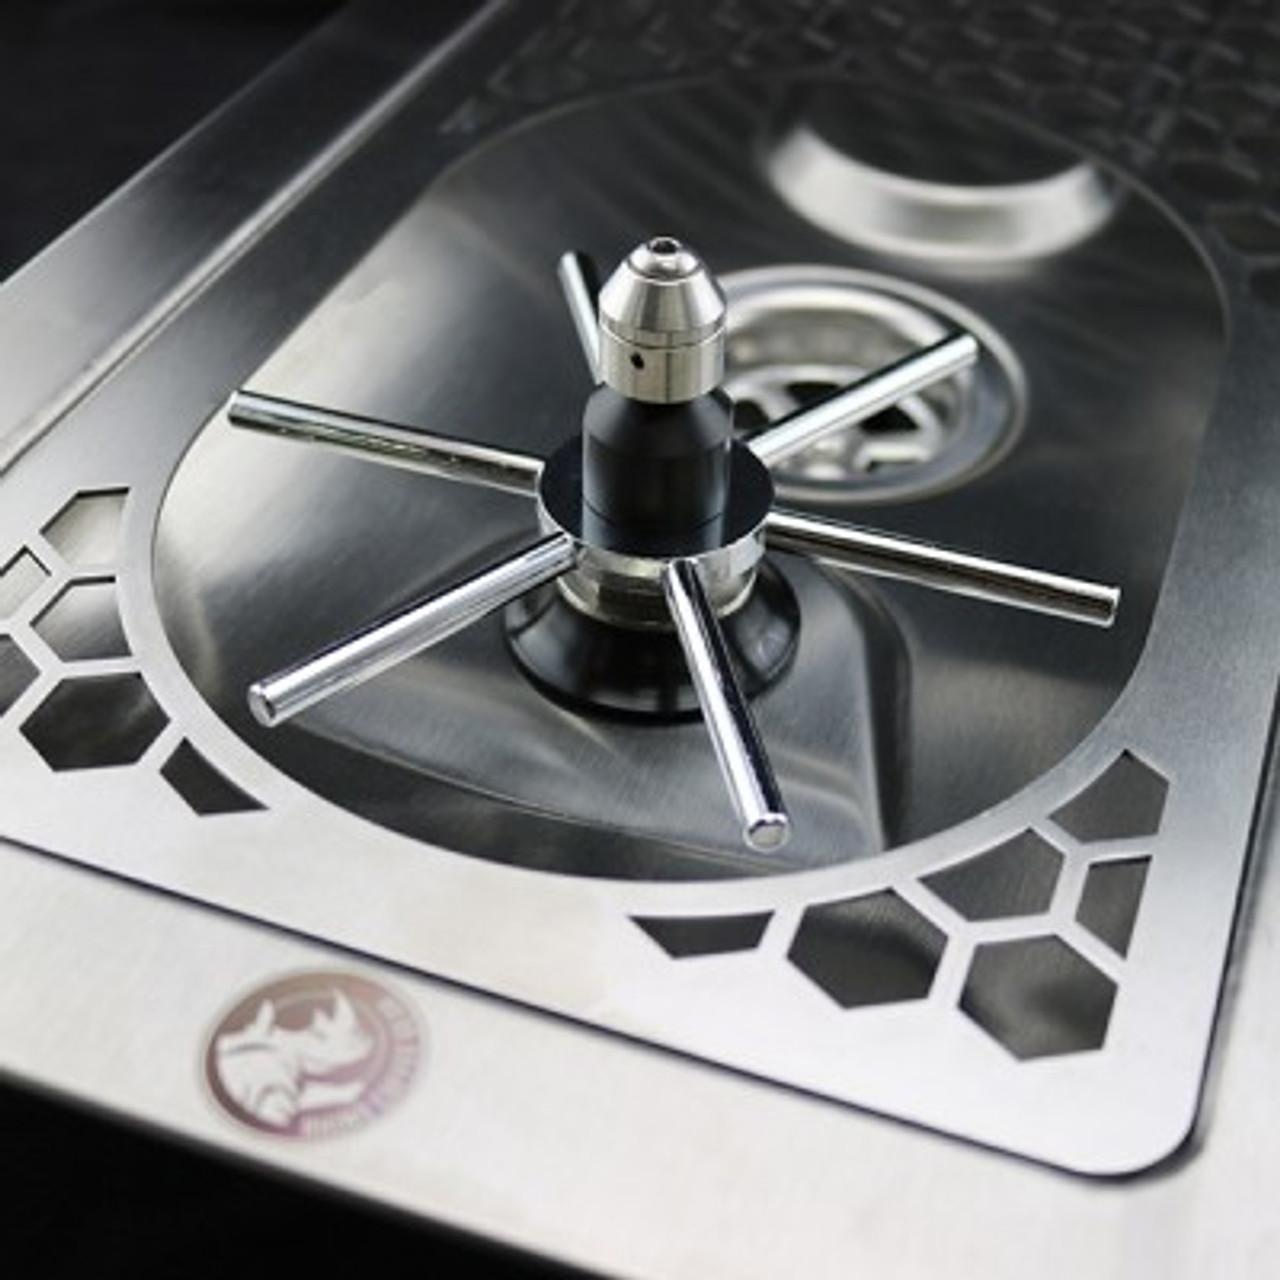 Rhino Coffee Gear Pitcher Rinser 600mm - Spinjet